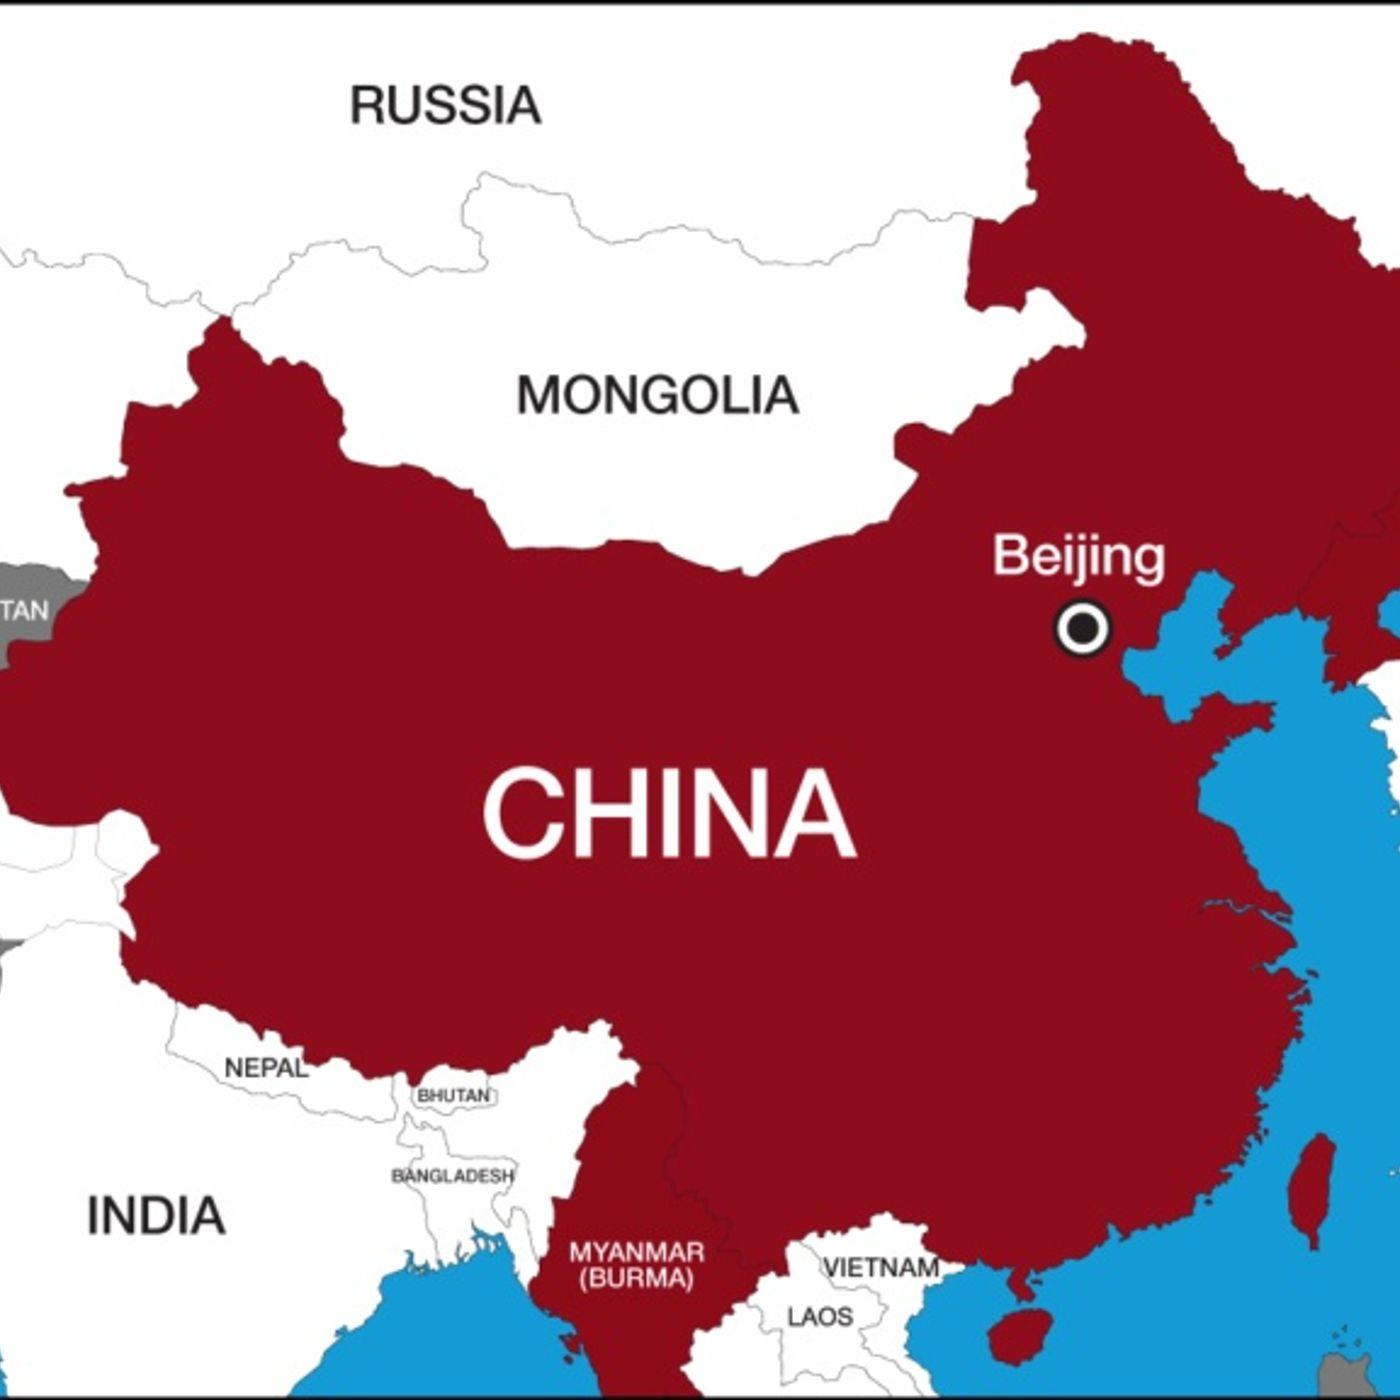 Persecution of Uighur Muslims